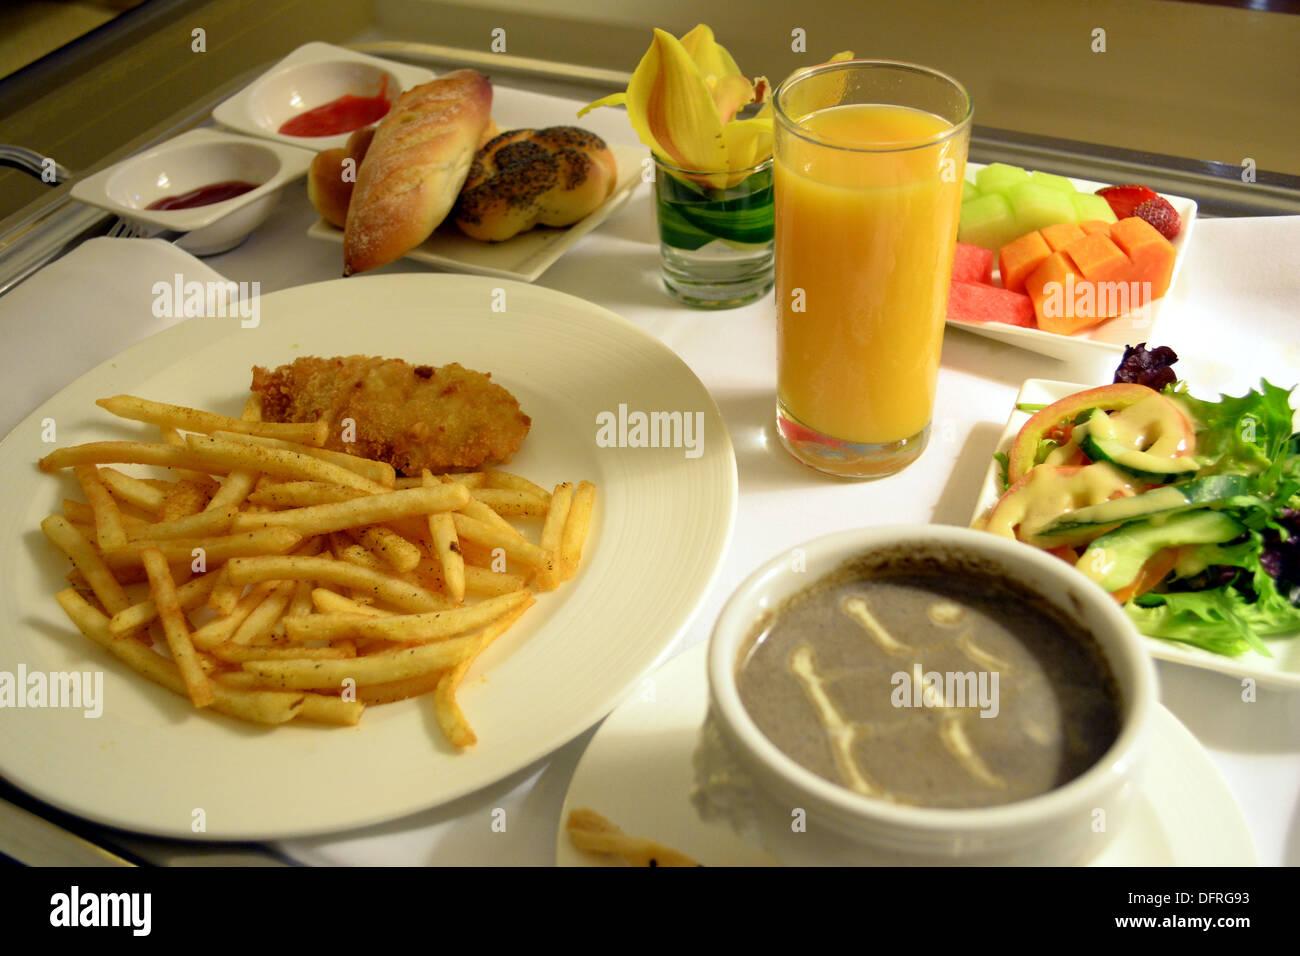 Room service; western set meal - Stock Image